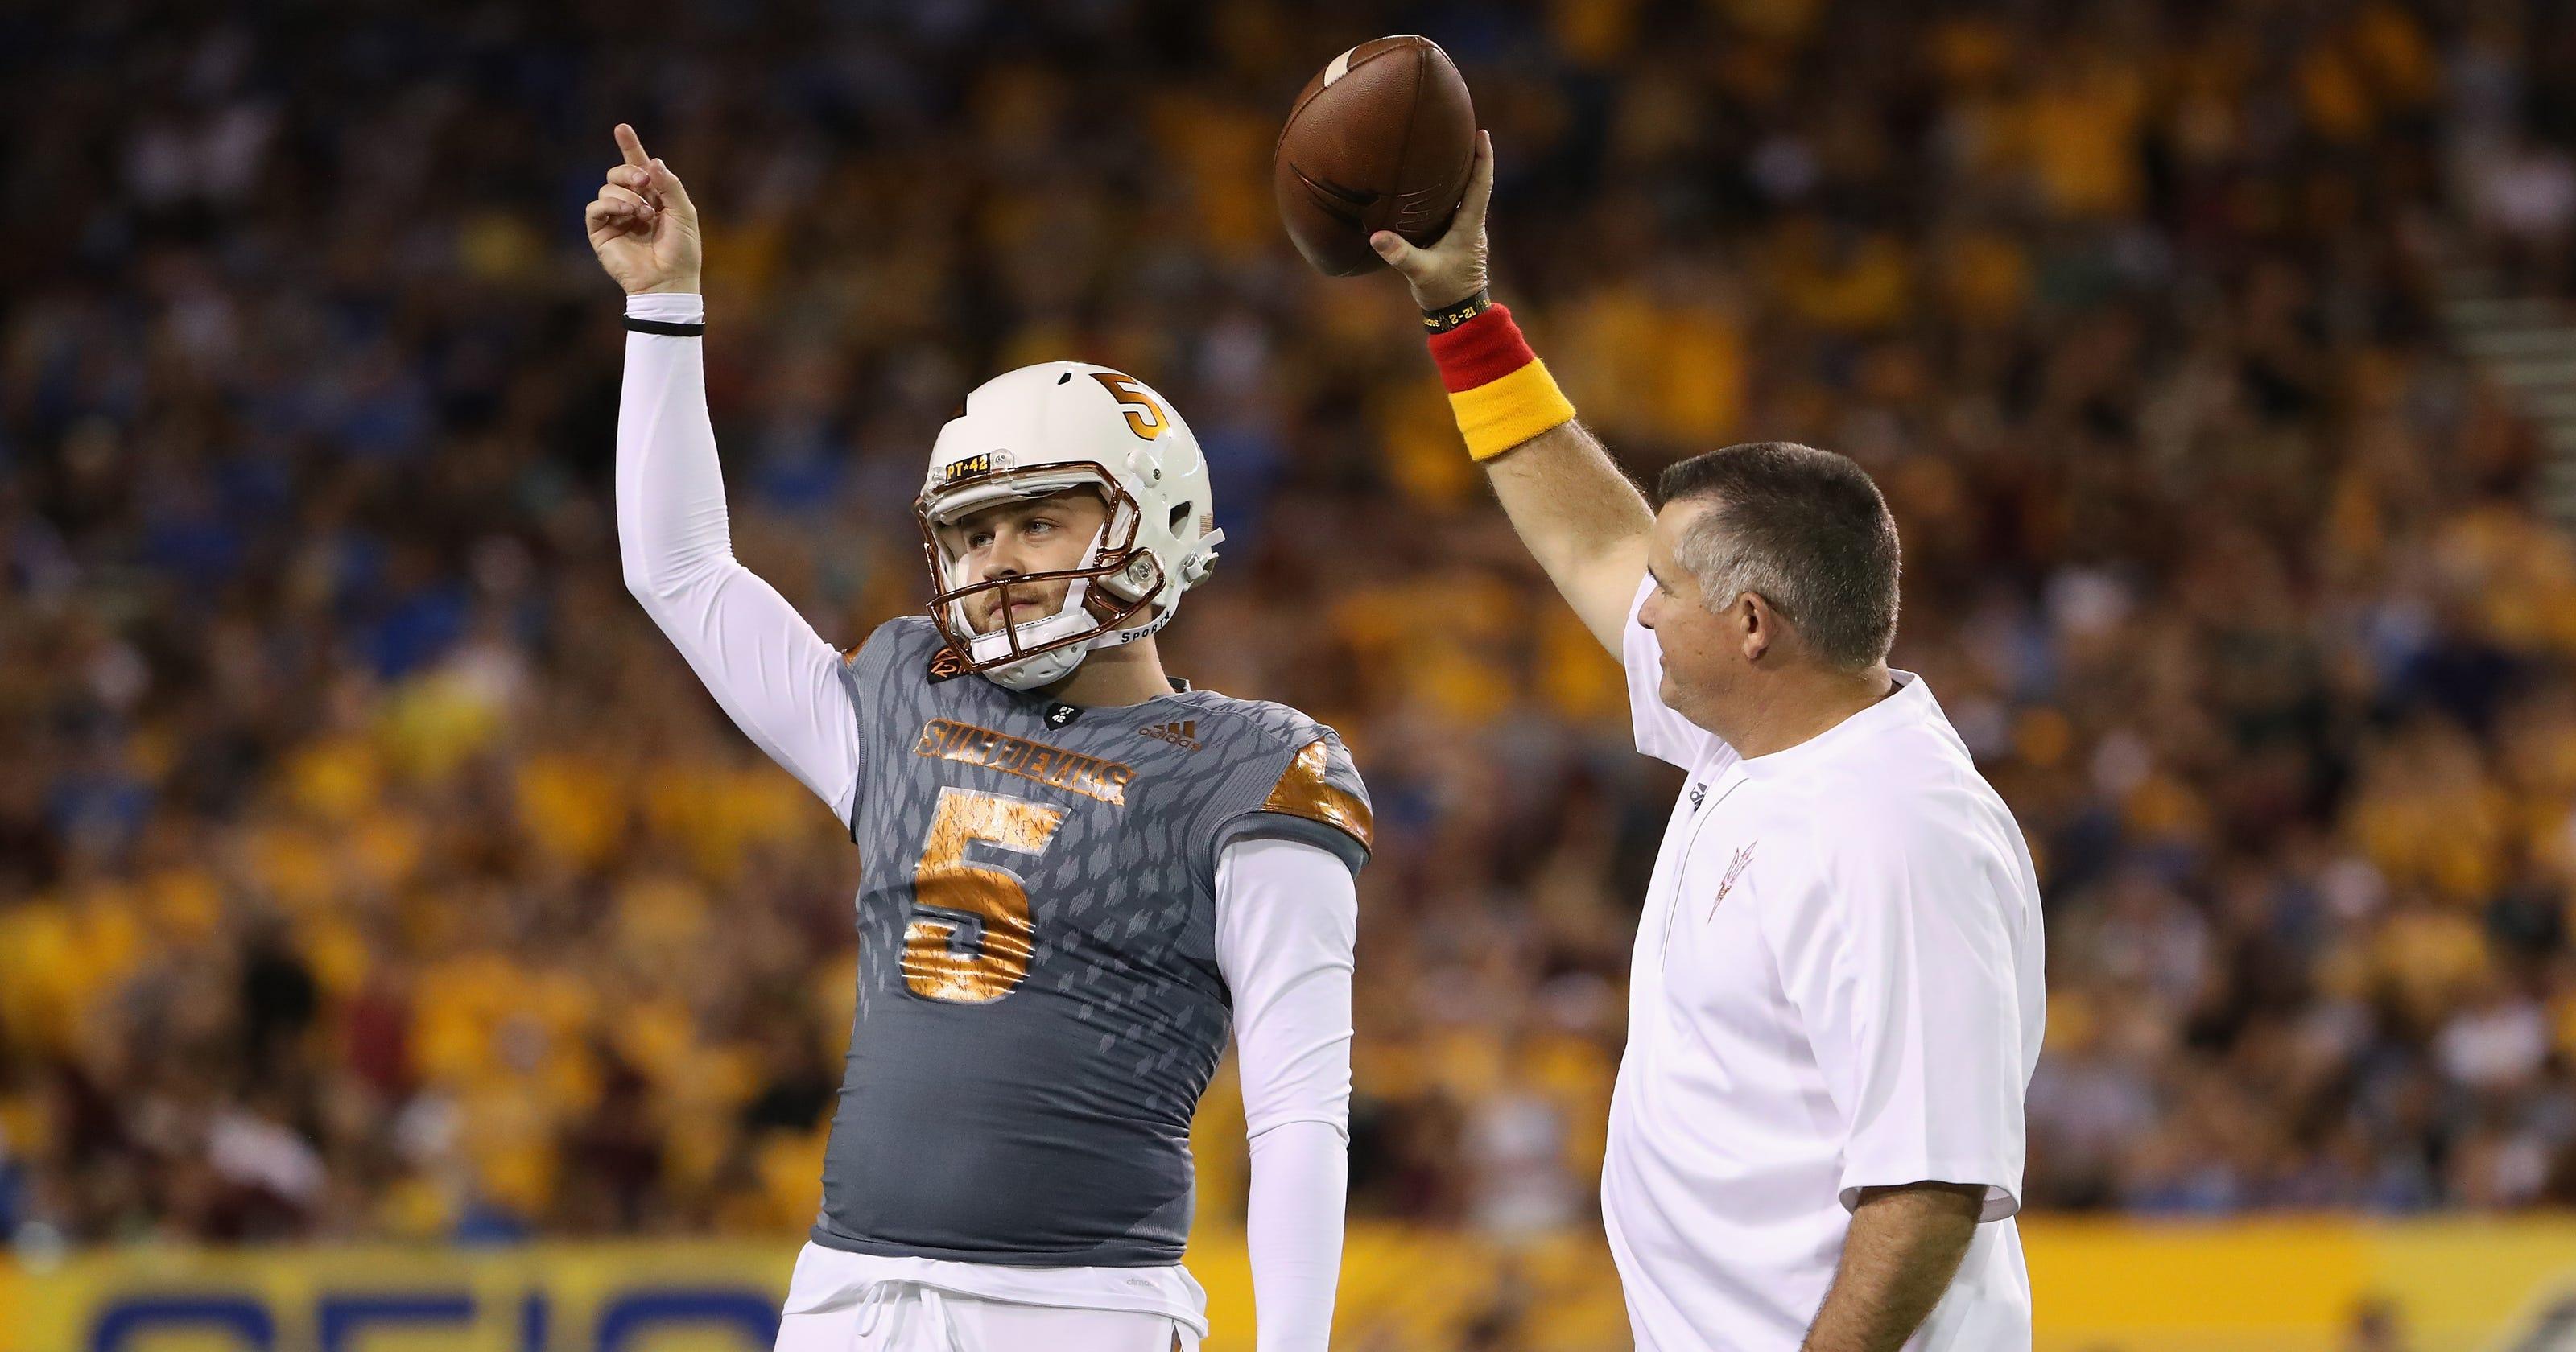 new style 9ad80 12ee4 NFL draft: Where will ASU's Zane Gonzalez get picked?